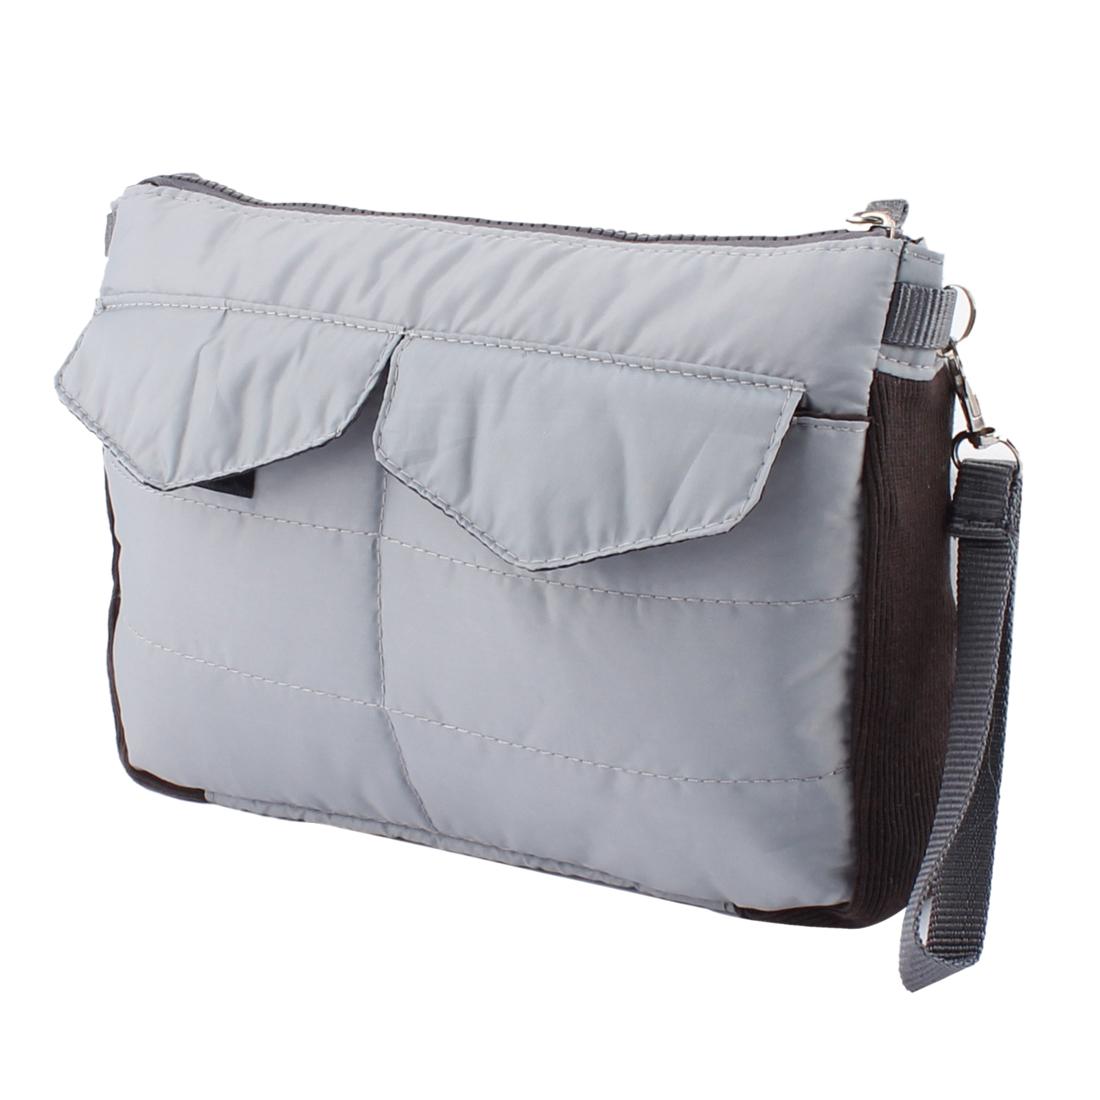 Gray Mini iPad Protective Sleeve Insert Handbag Gadget Pouch Organizer Storage Bag